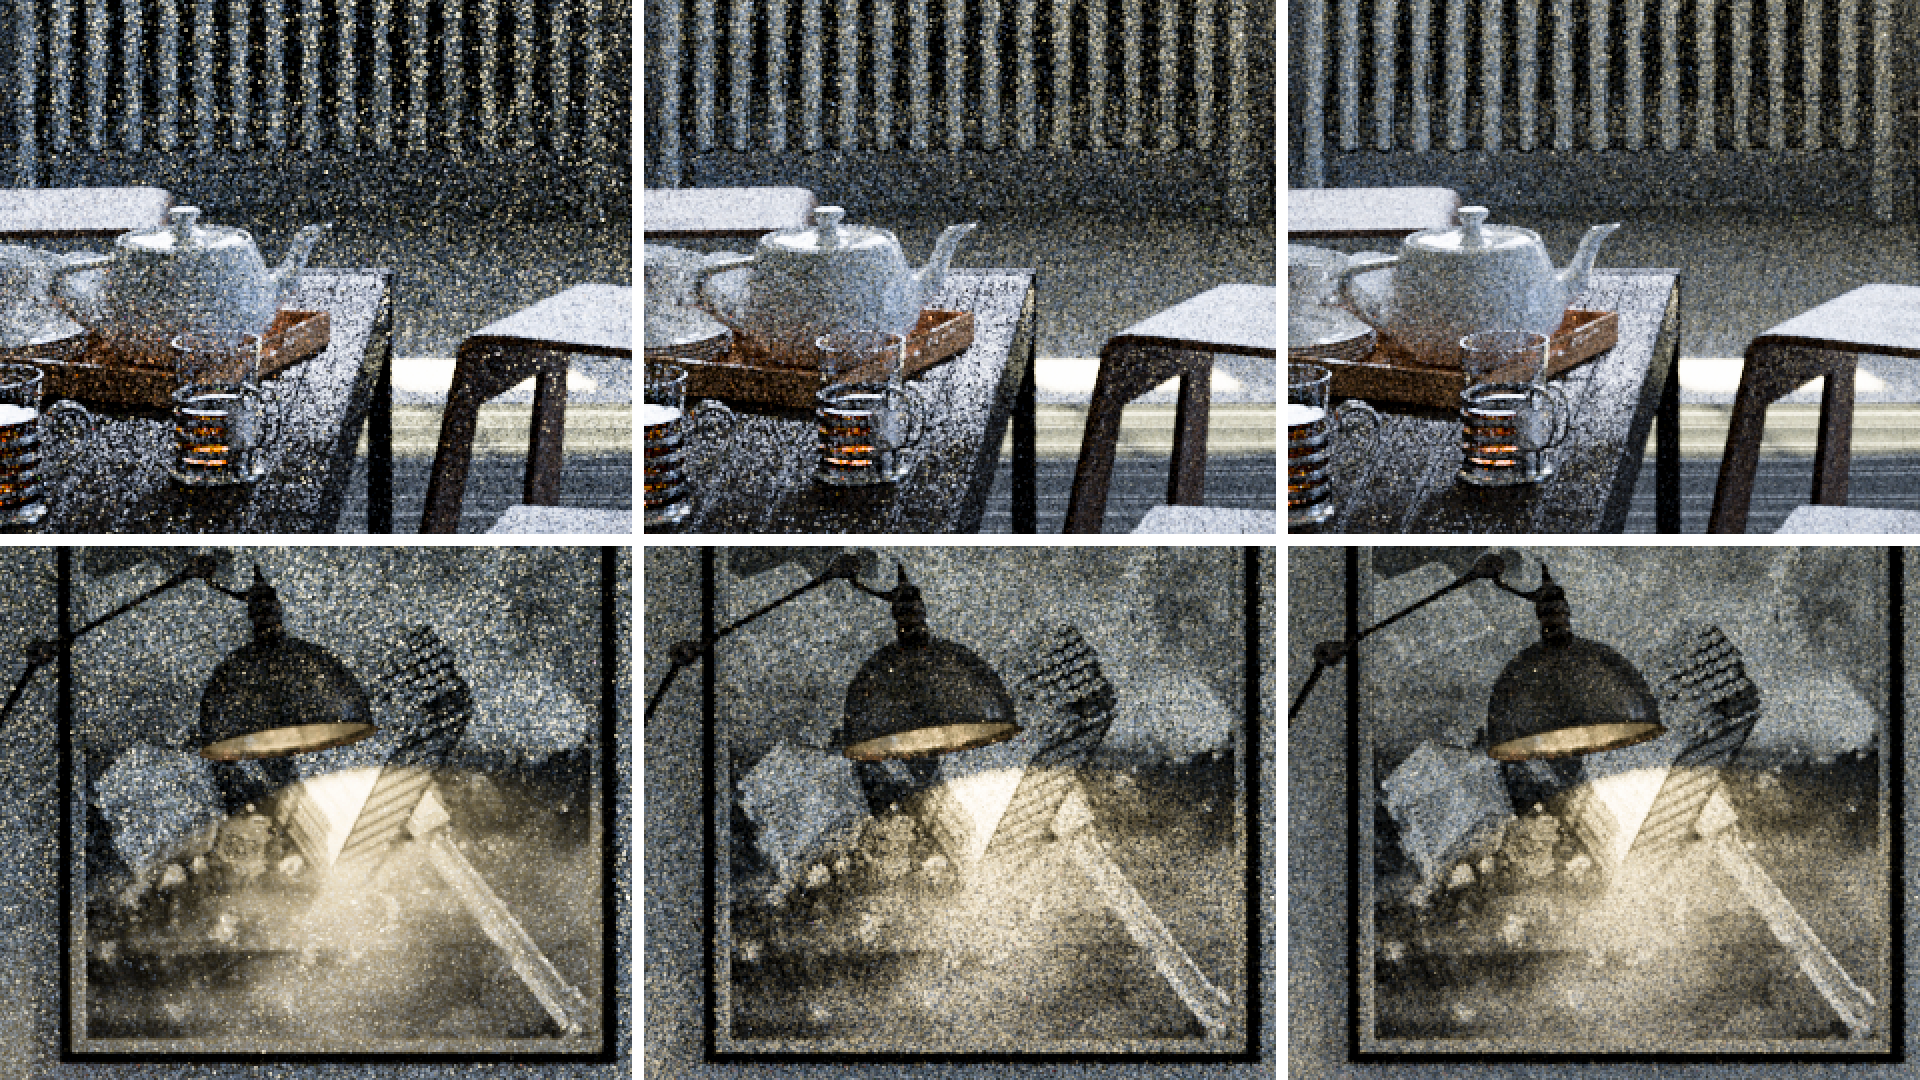 Figure 5: Zoomed crops of Figures 2 through 4. From left to right: uniform random sampling, equal sample power-weighted sampling, and equal time power-weighted sampling.